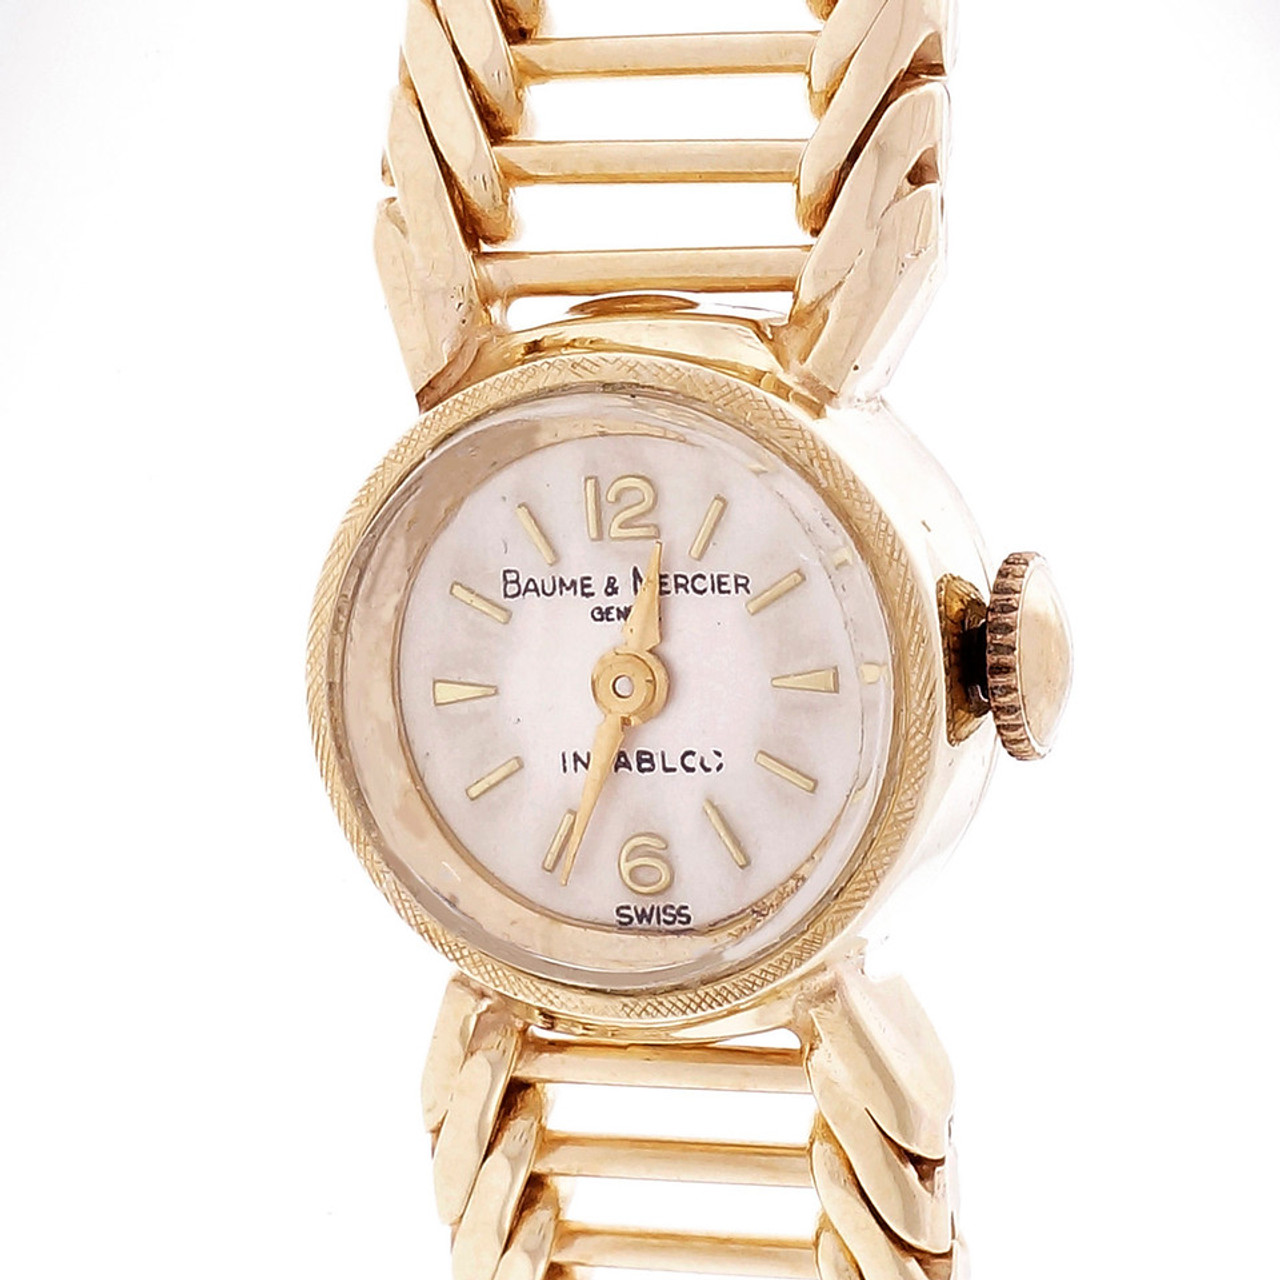 185a170fd2d Baume   Mercier Ladies 1960 Vintage Wrist Watch 14k Yellow Gold -  petersuchyjewelers